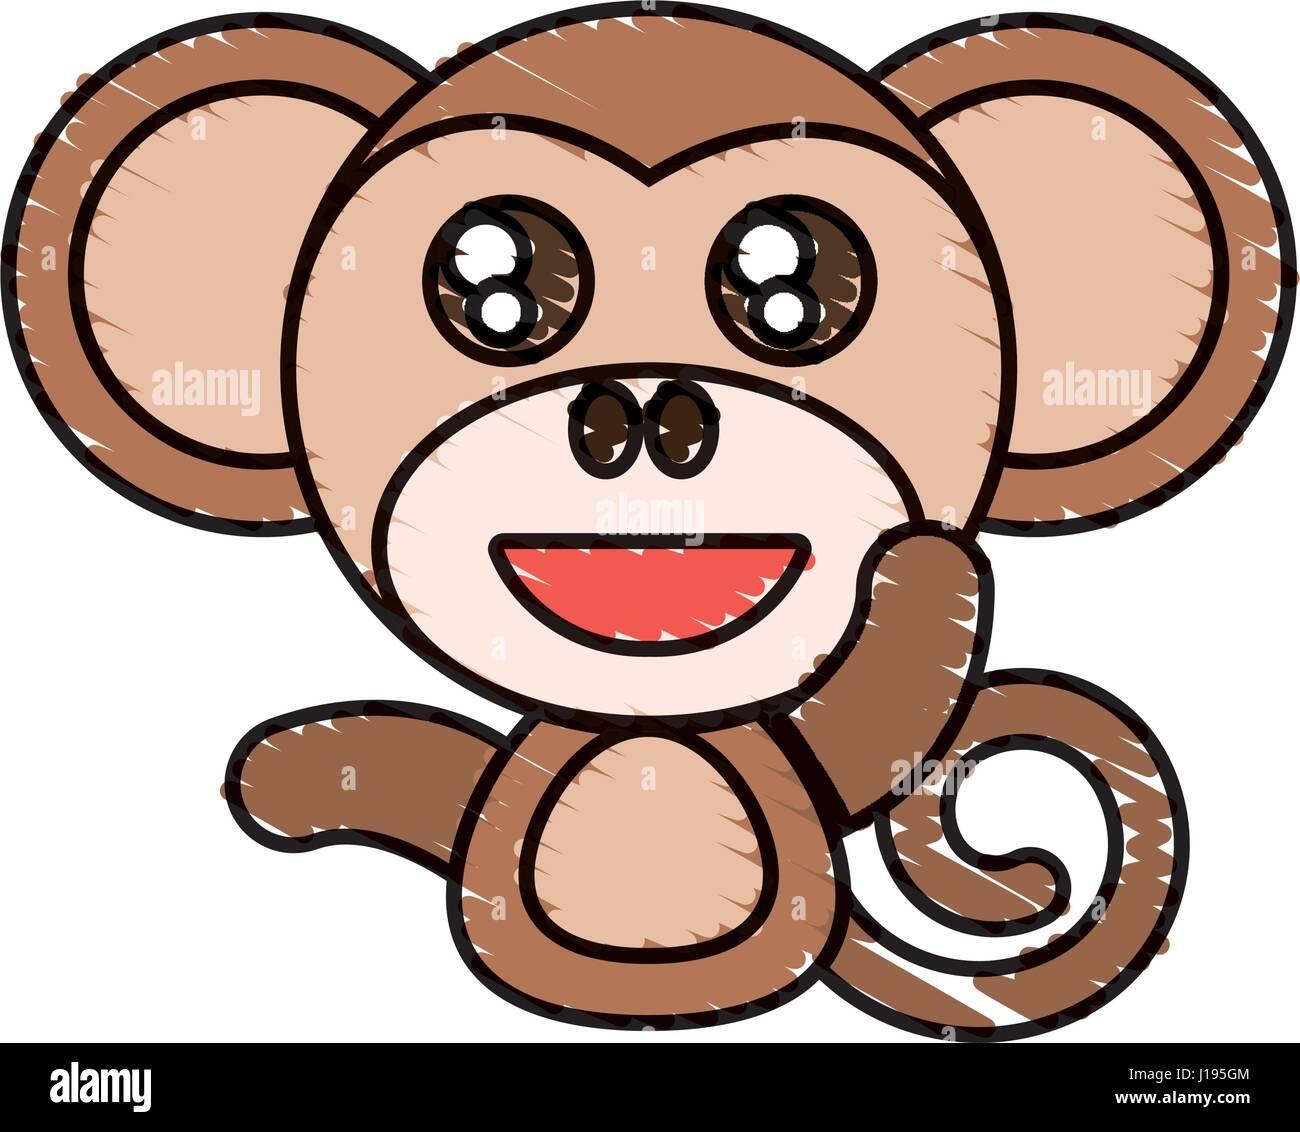 Draw Monkey Animal Comic Stock Vector Art Illustration Vector